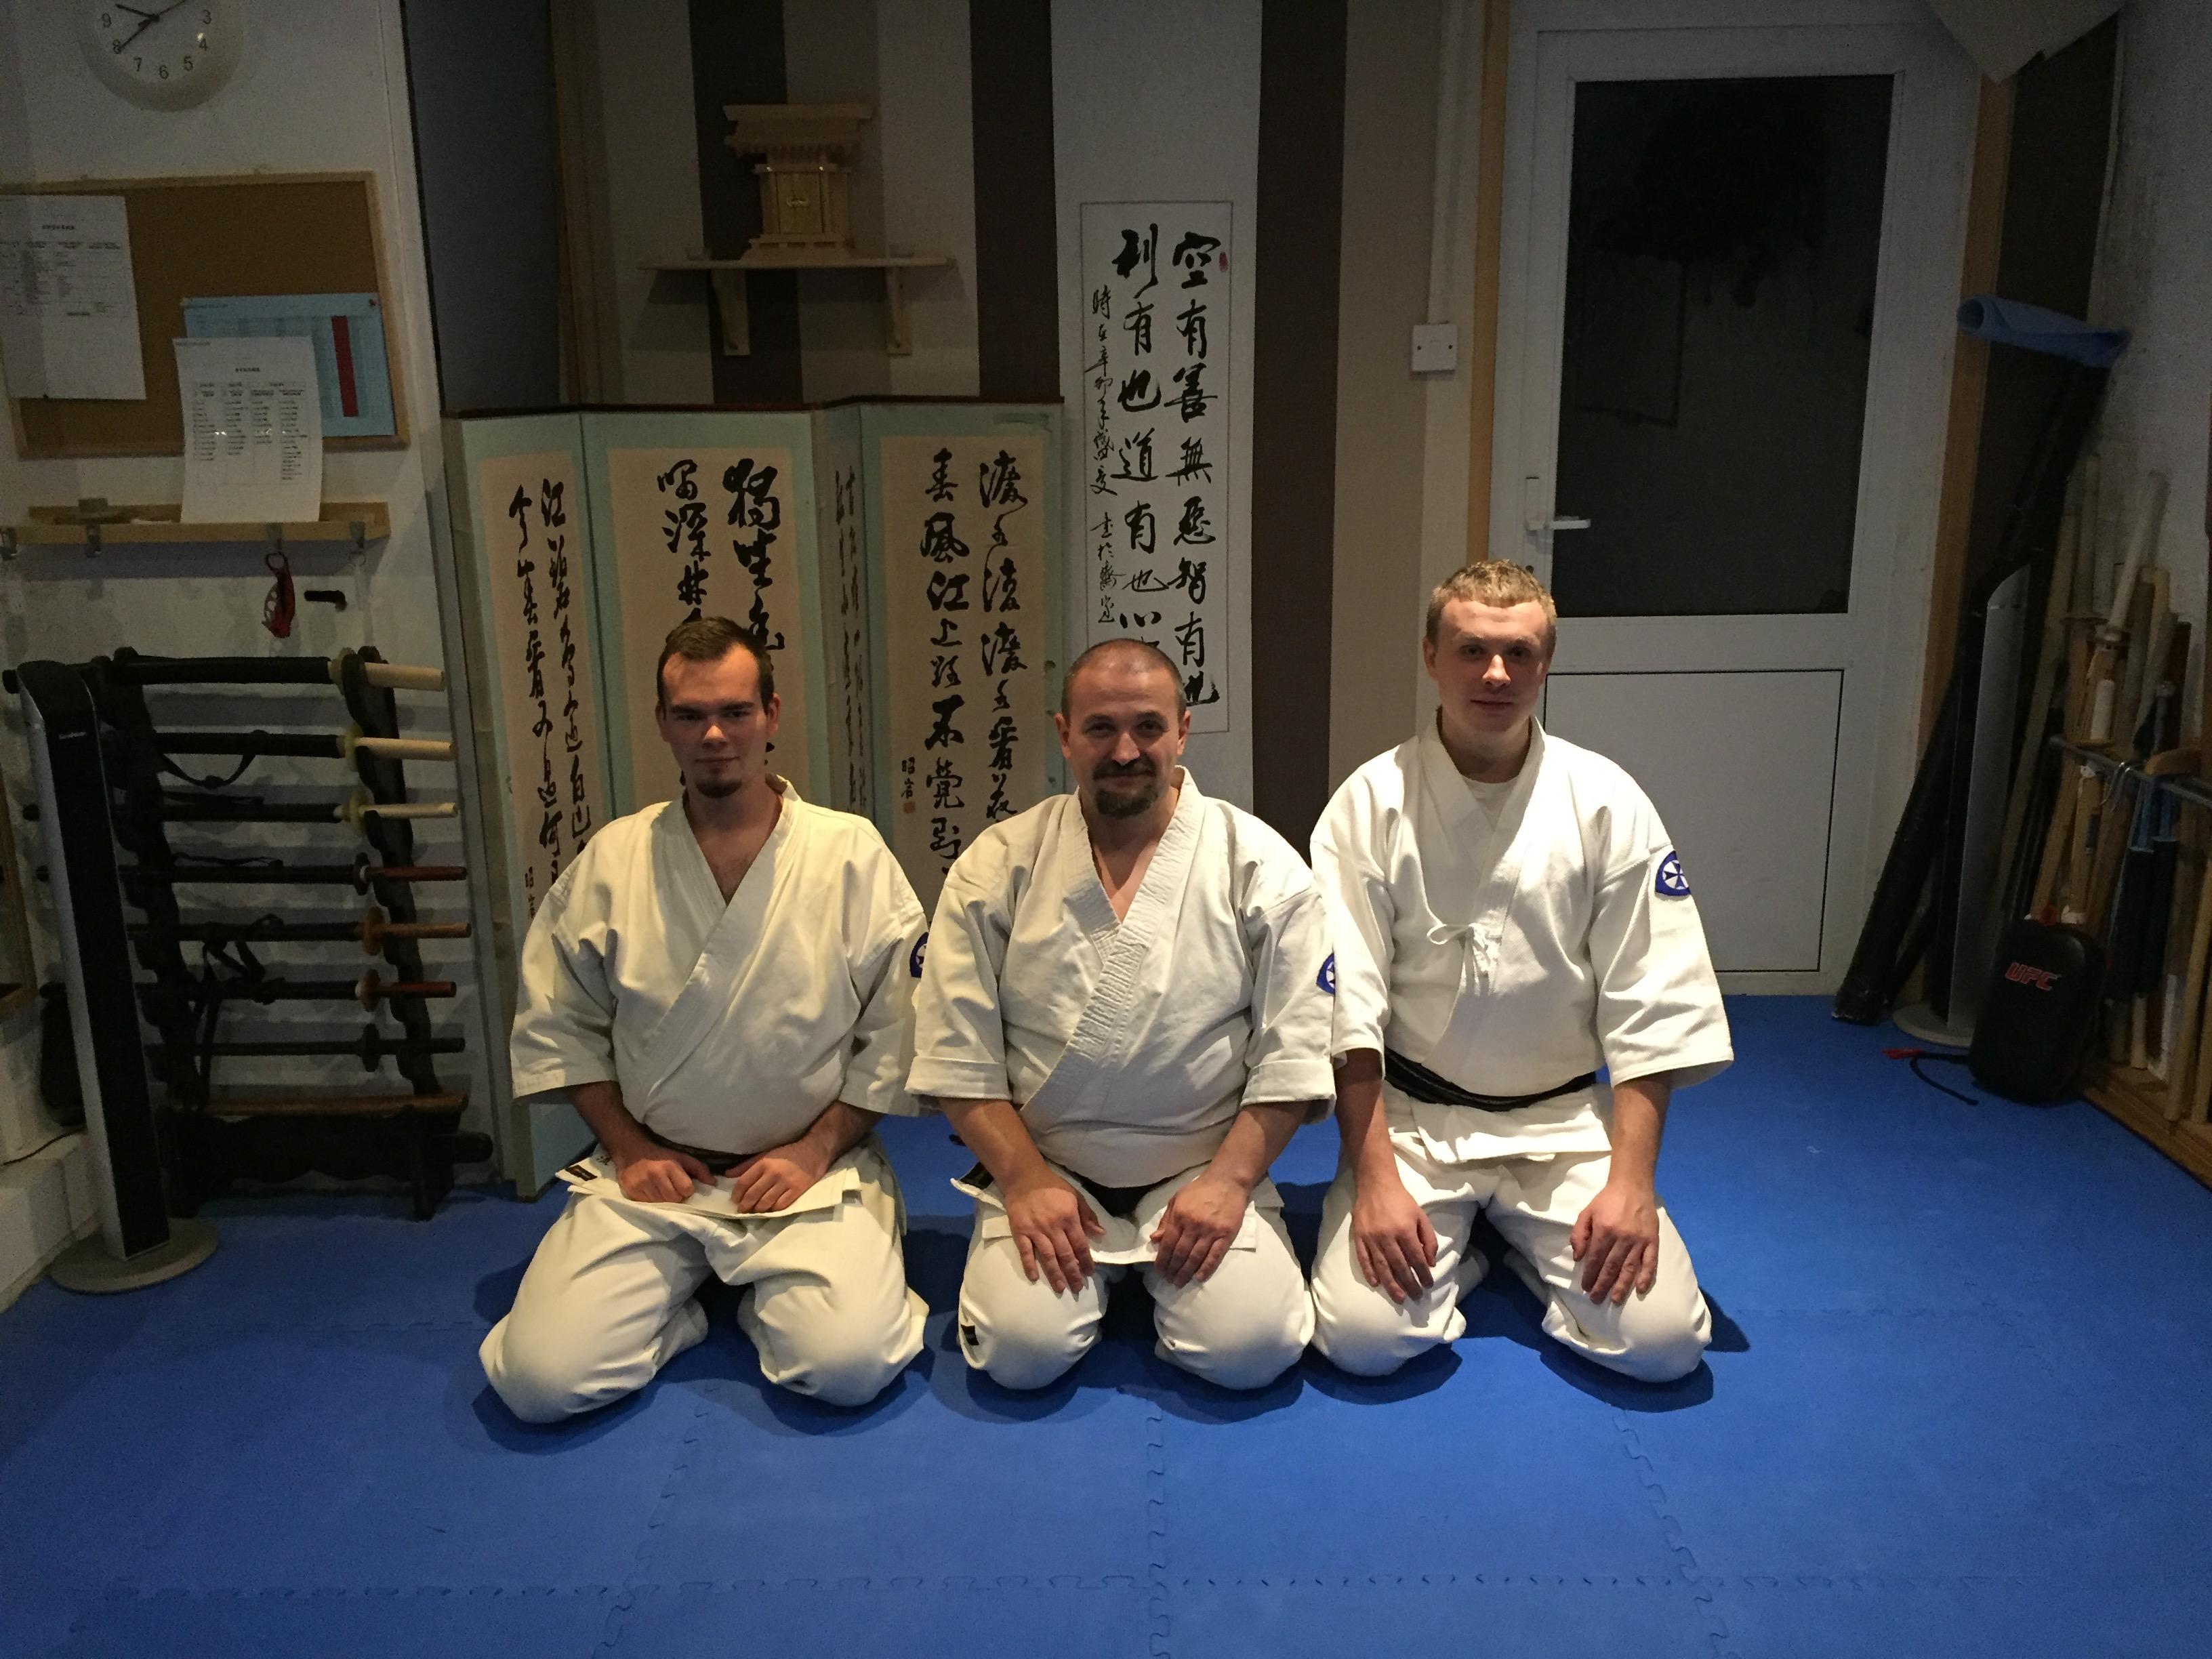 Makotoshin Dojo